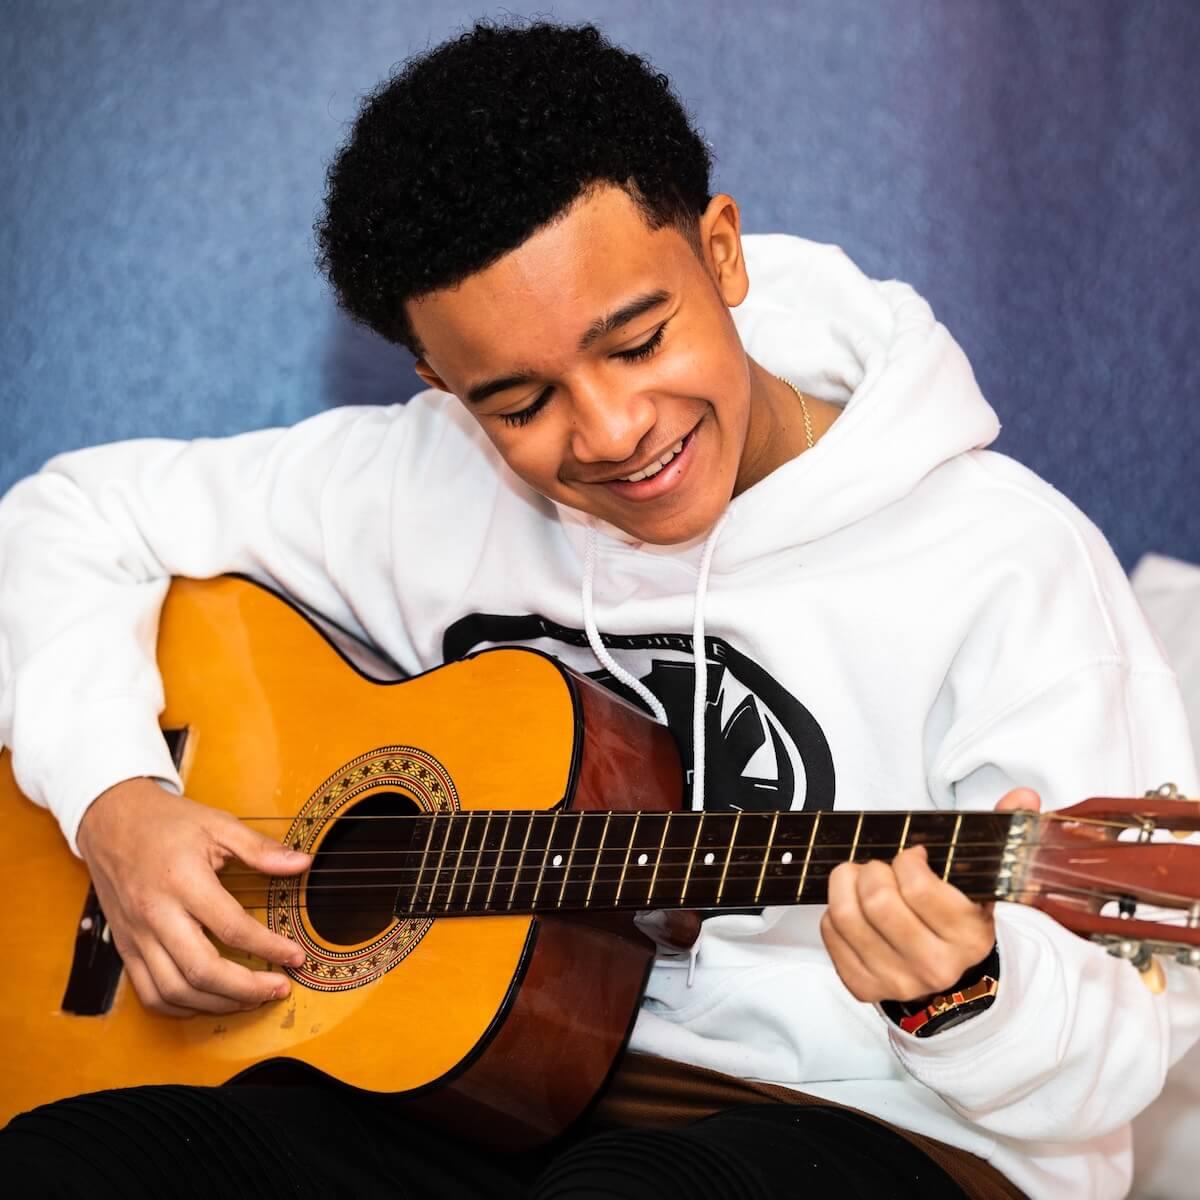 Cameron J Wright playing guitar